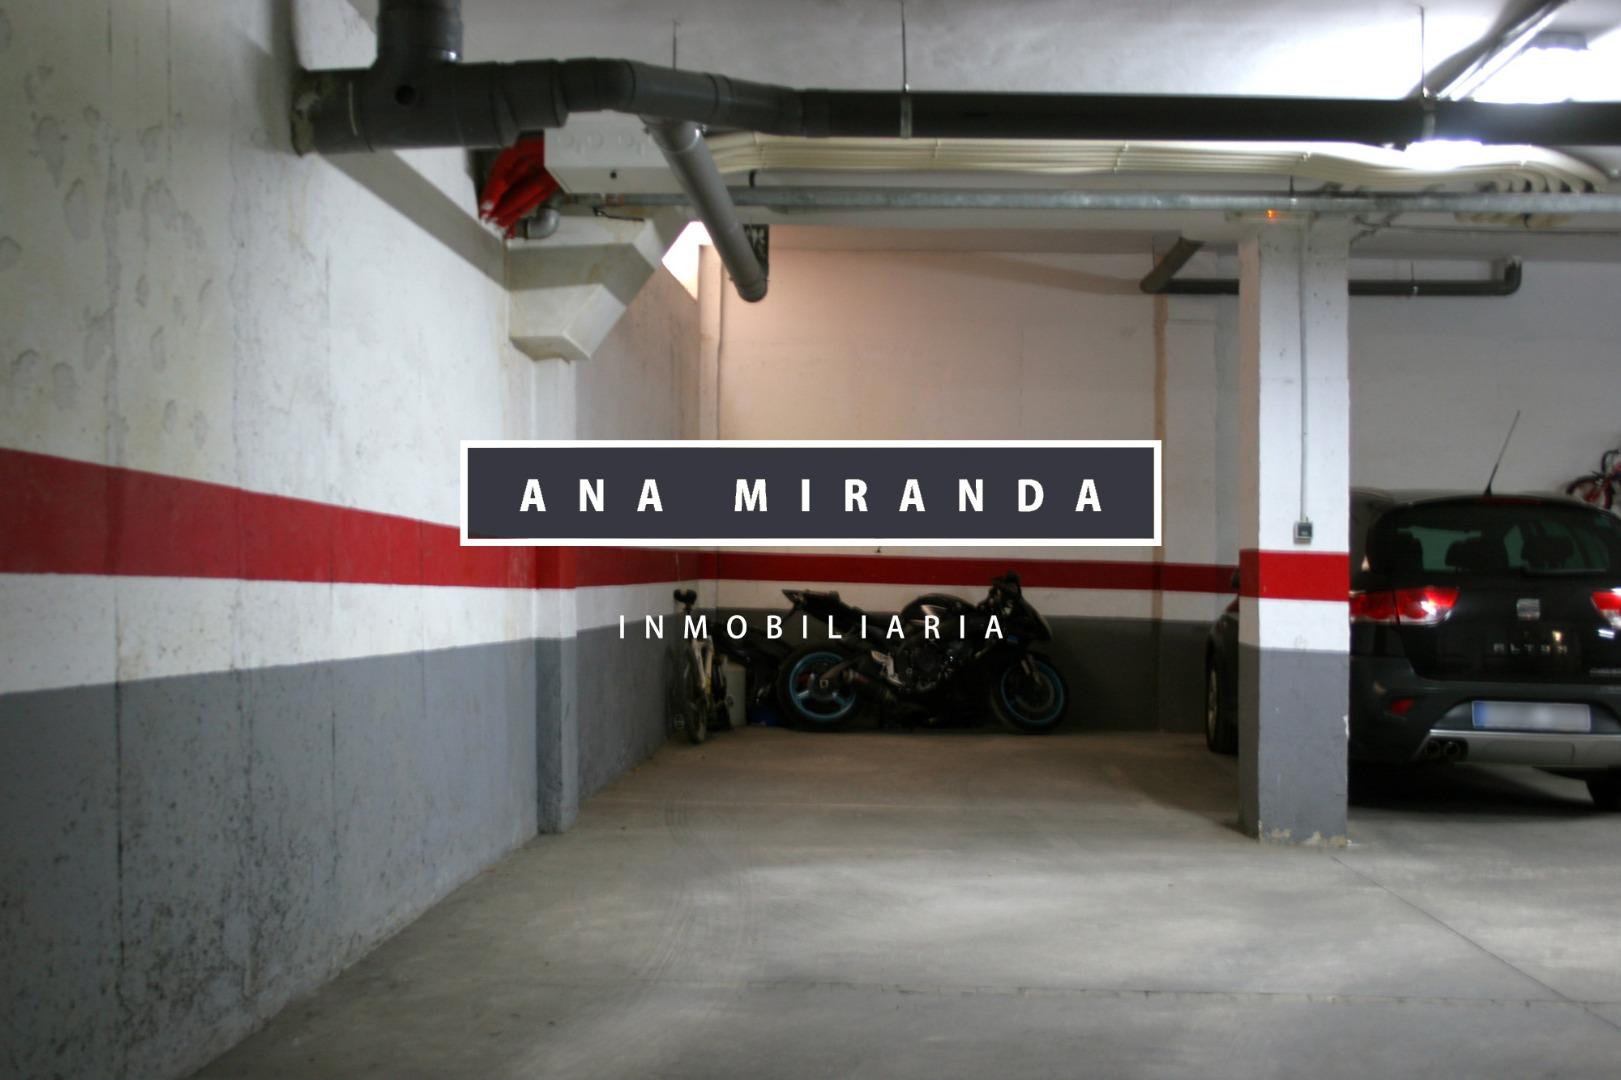 Posto auto  Alboraya - alboraya centro